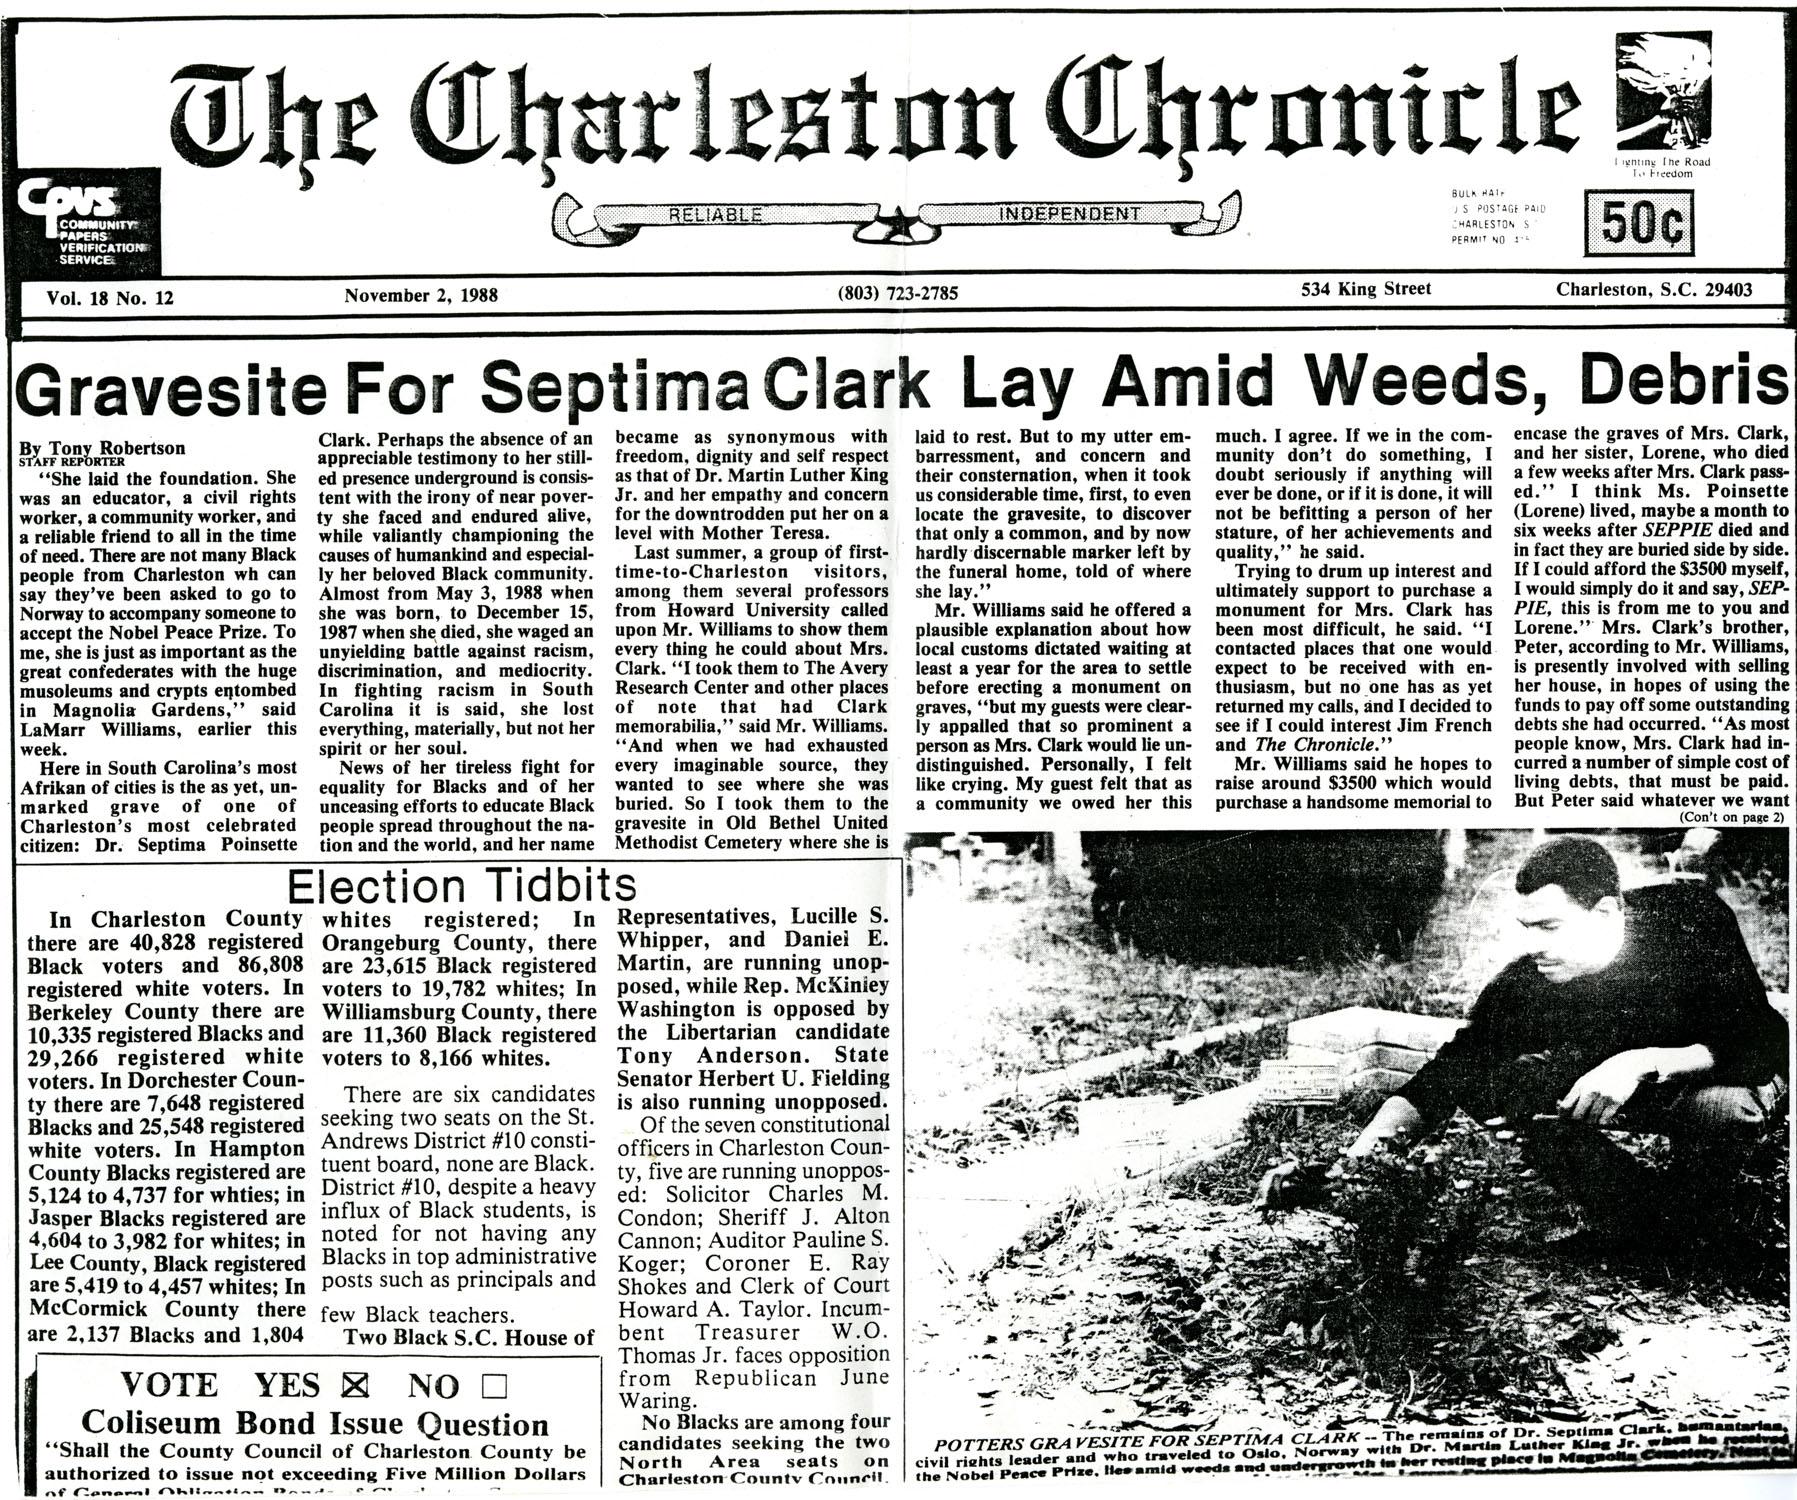 Newspaper Article, November 2, 1988